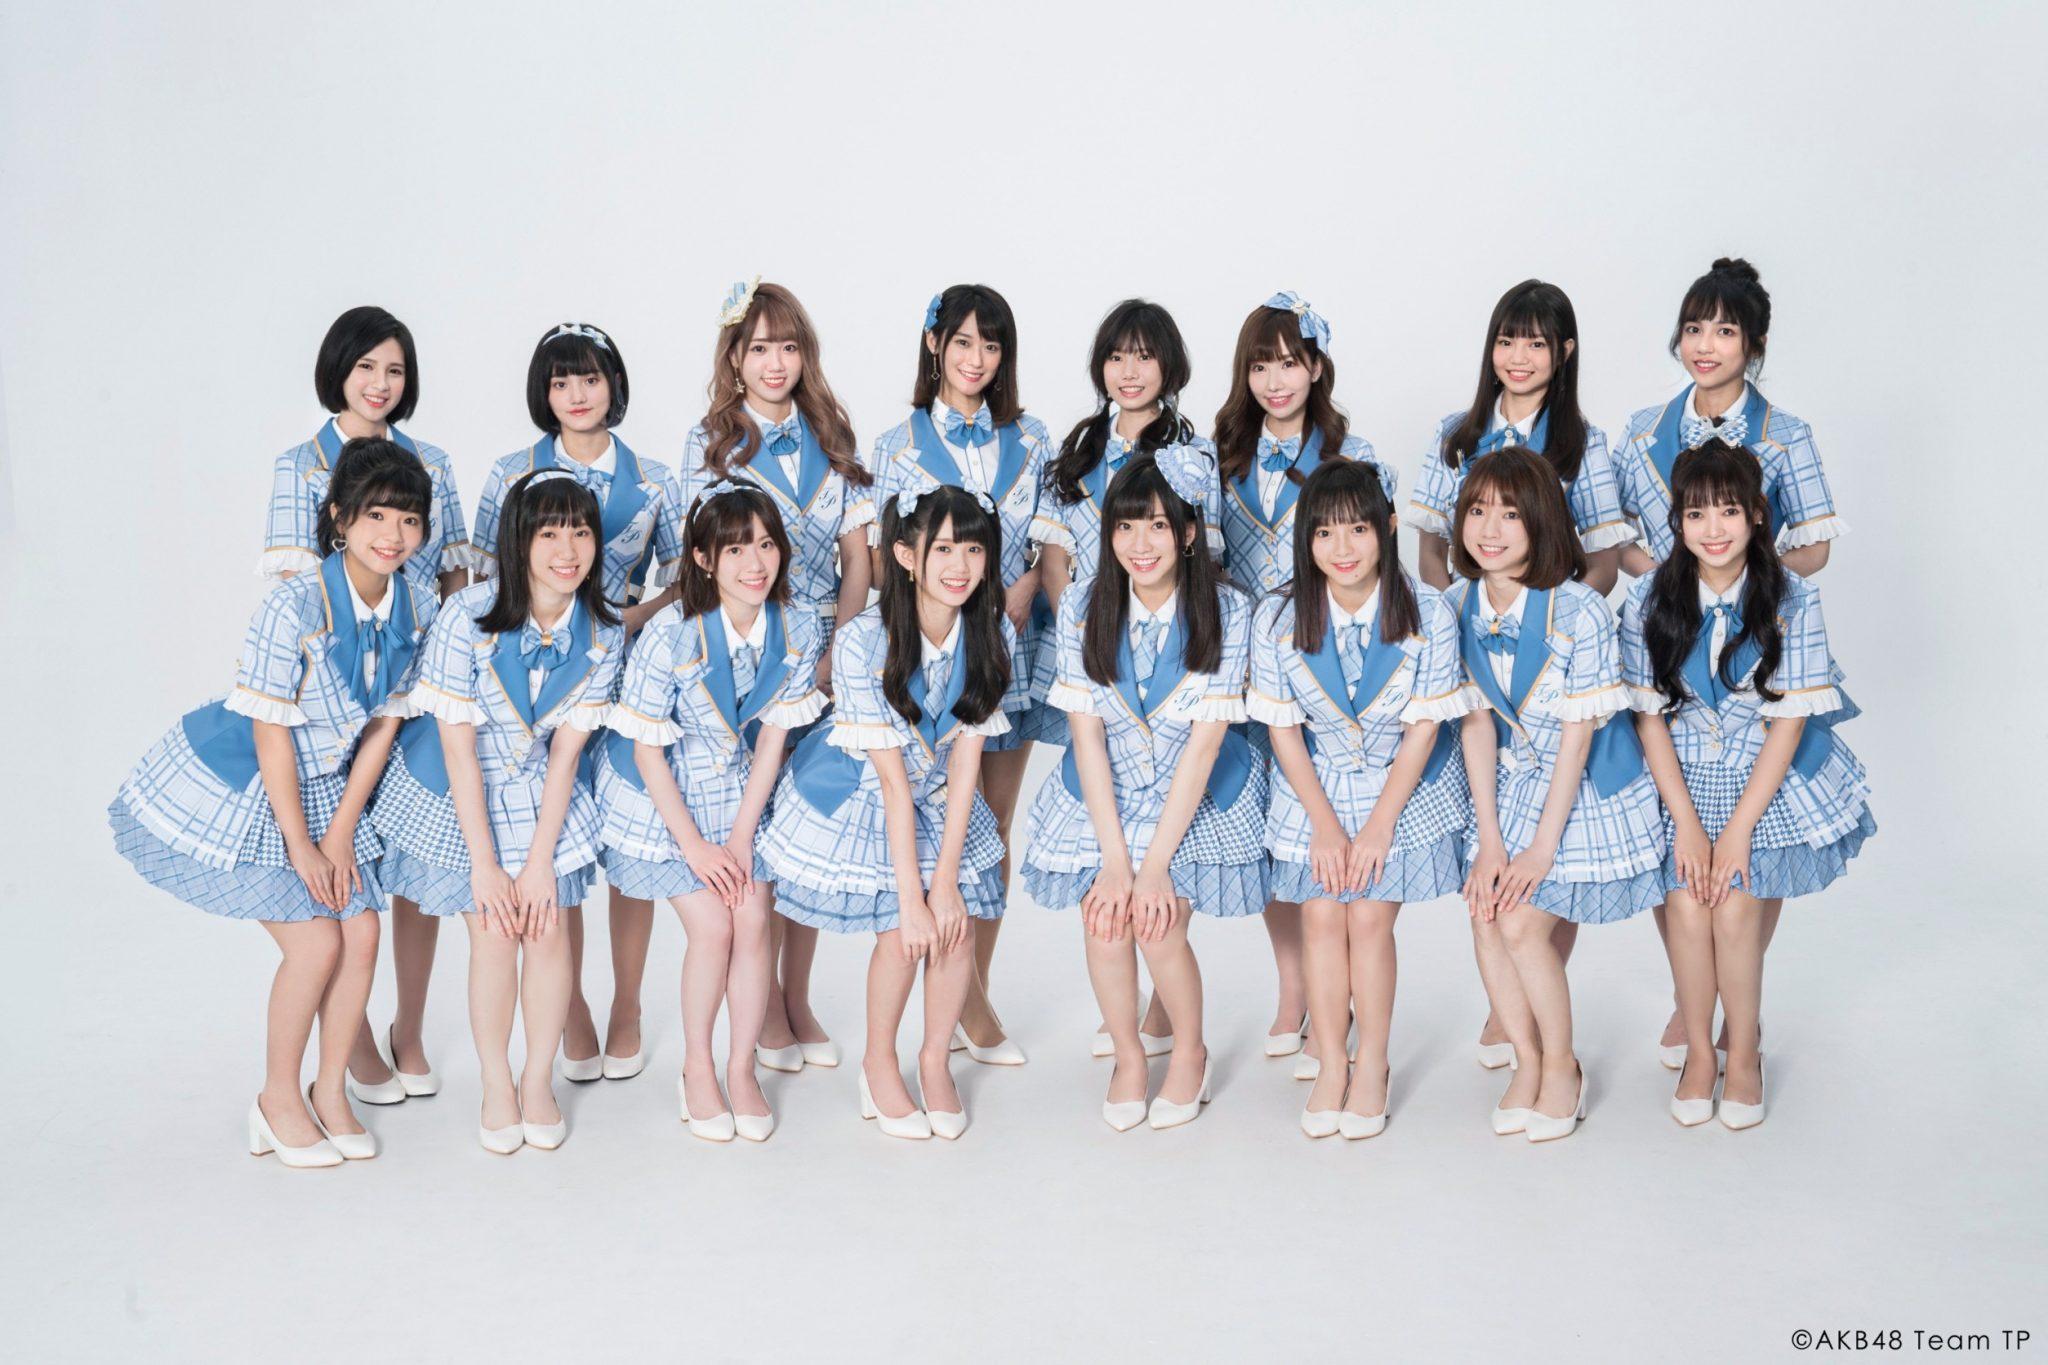 AKB48 Team TP推首张原创单曲《一秒一秒约好》全新水蓝格子制服曝光!-itotii